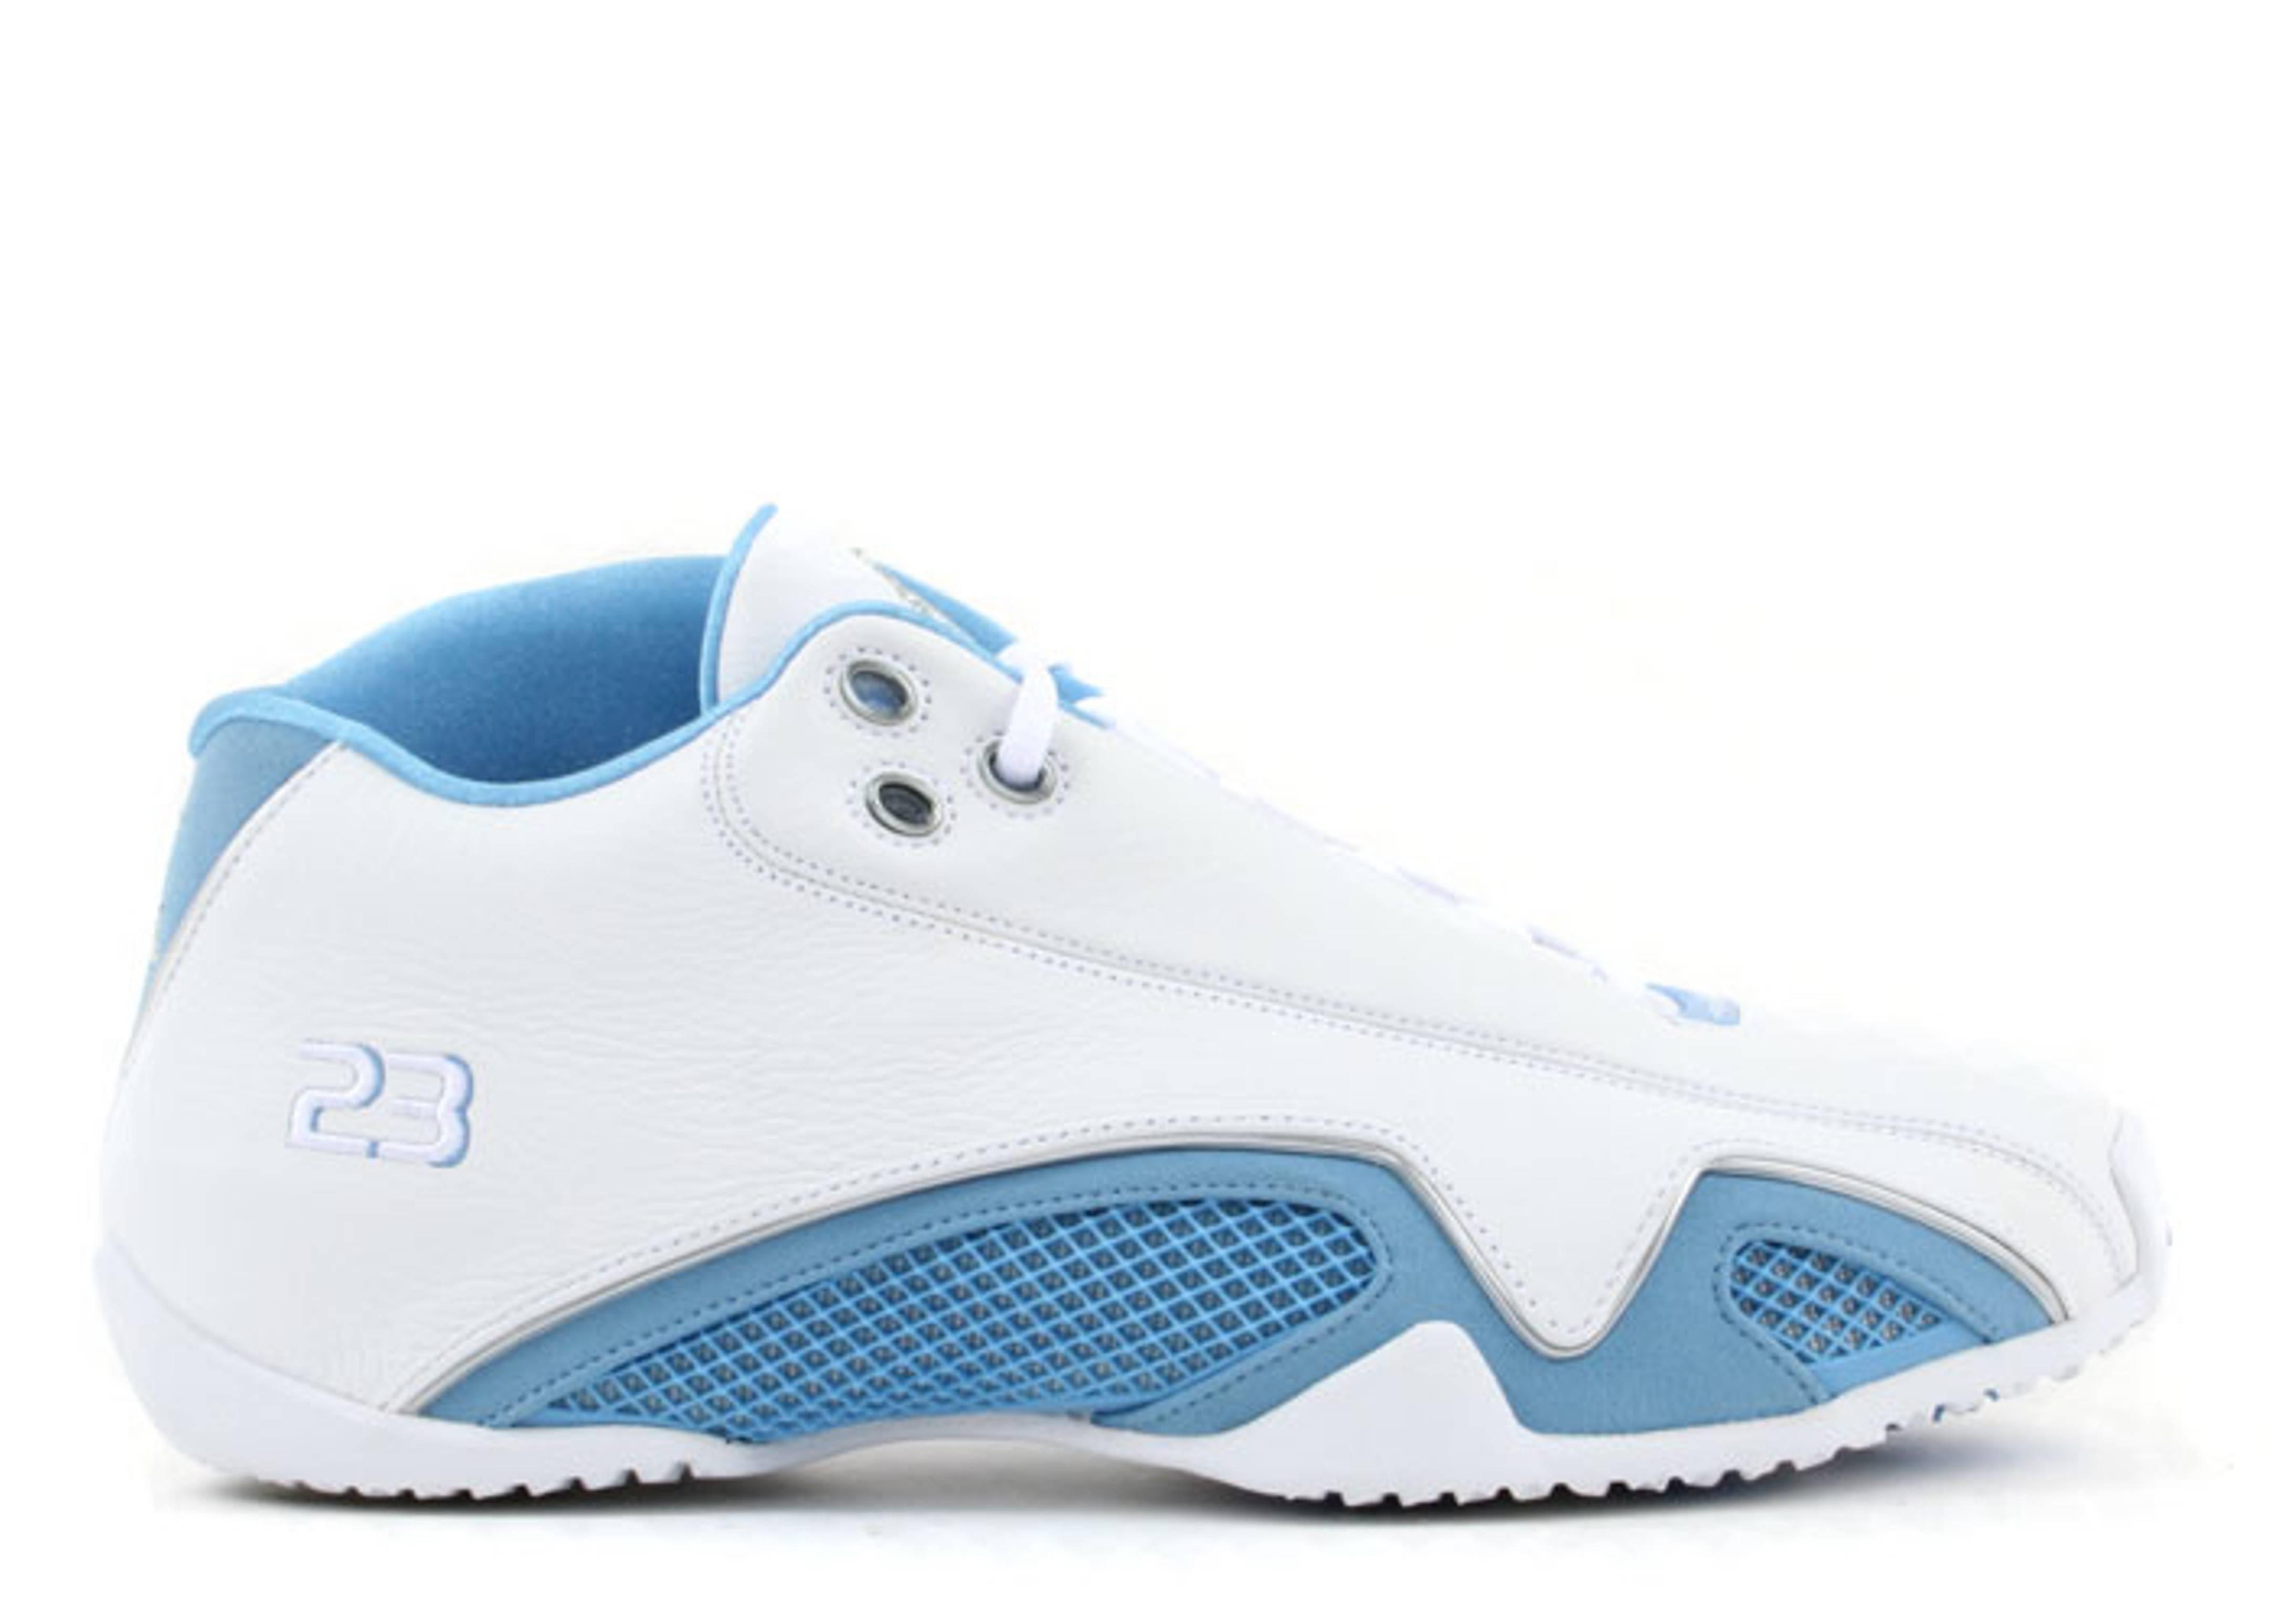 1ff168f39fa6a5 Air Jordan 21 (XXI) Shoes - Nike